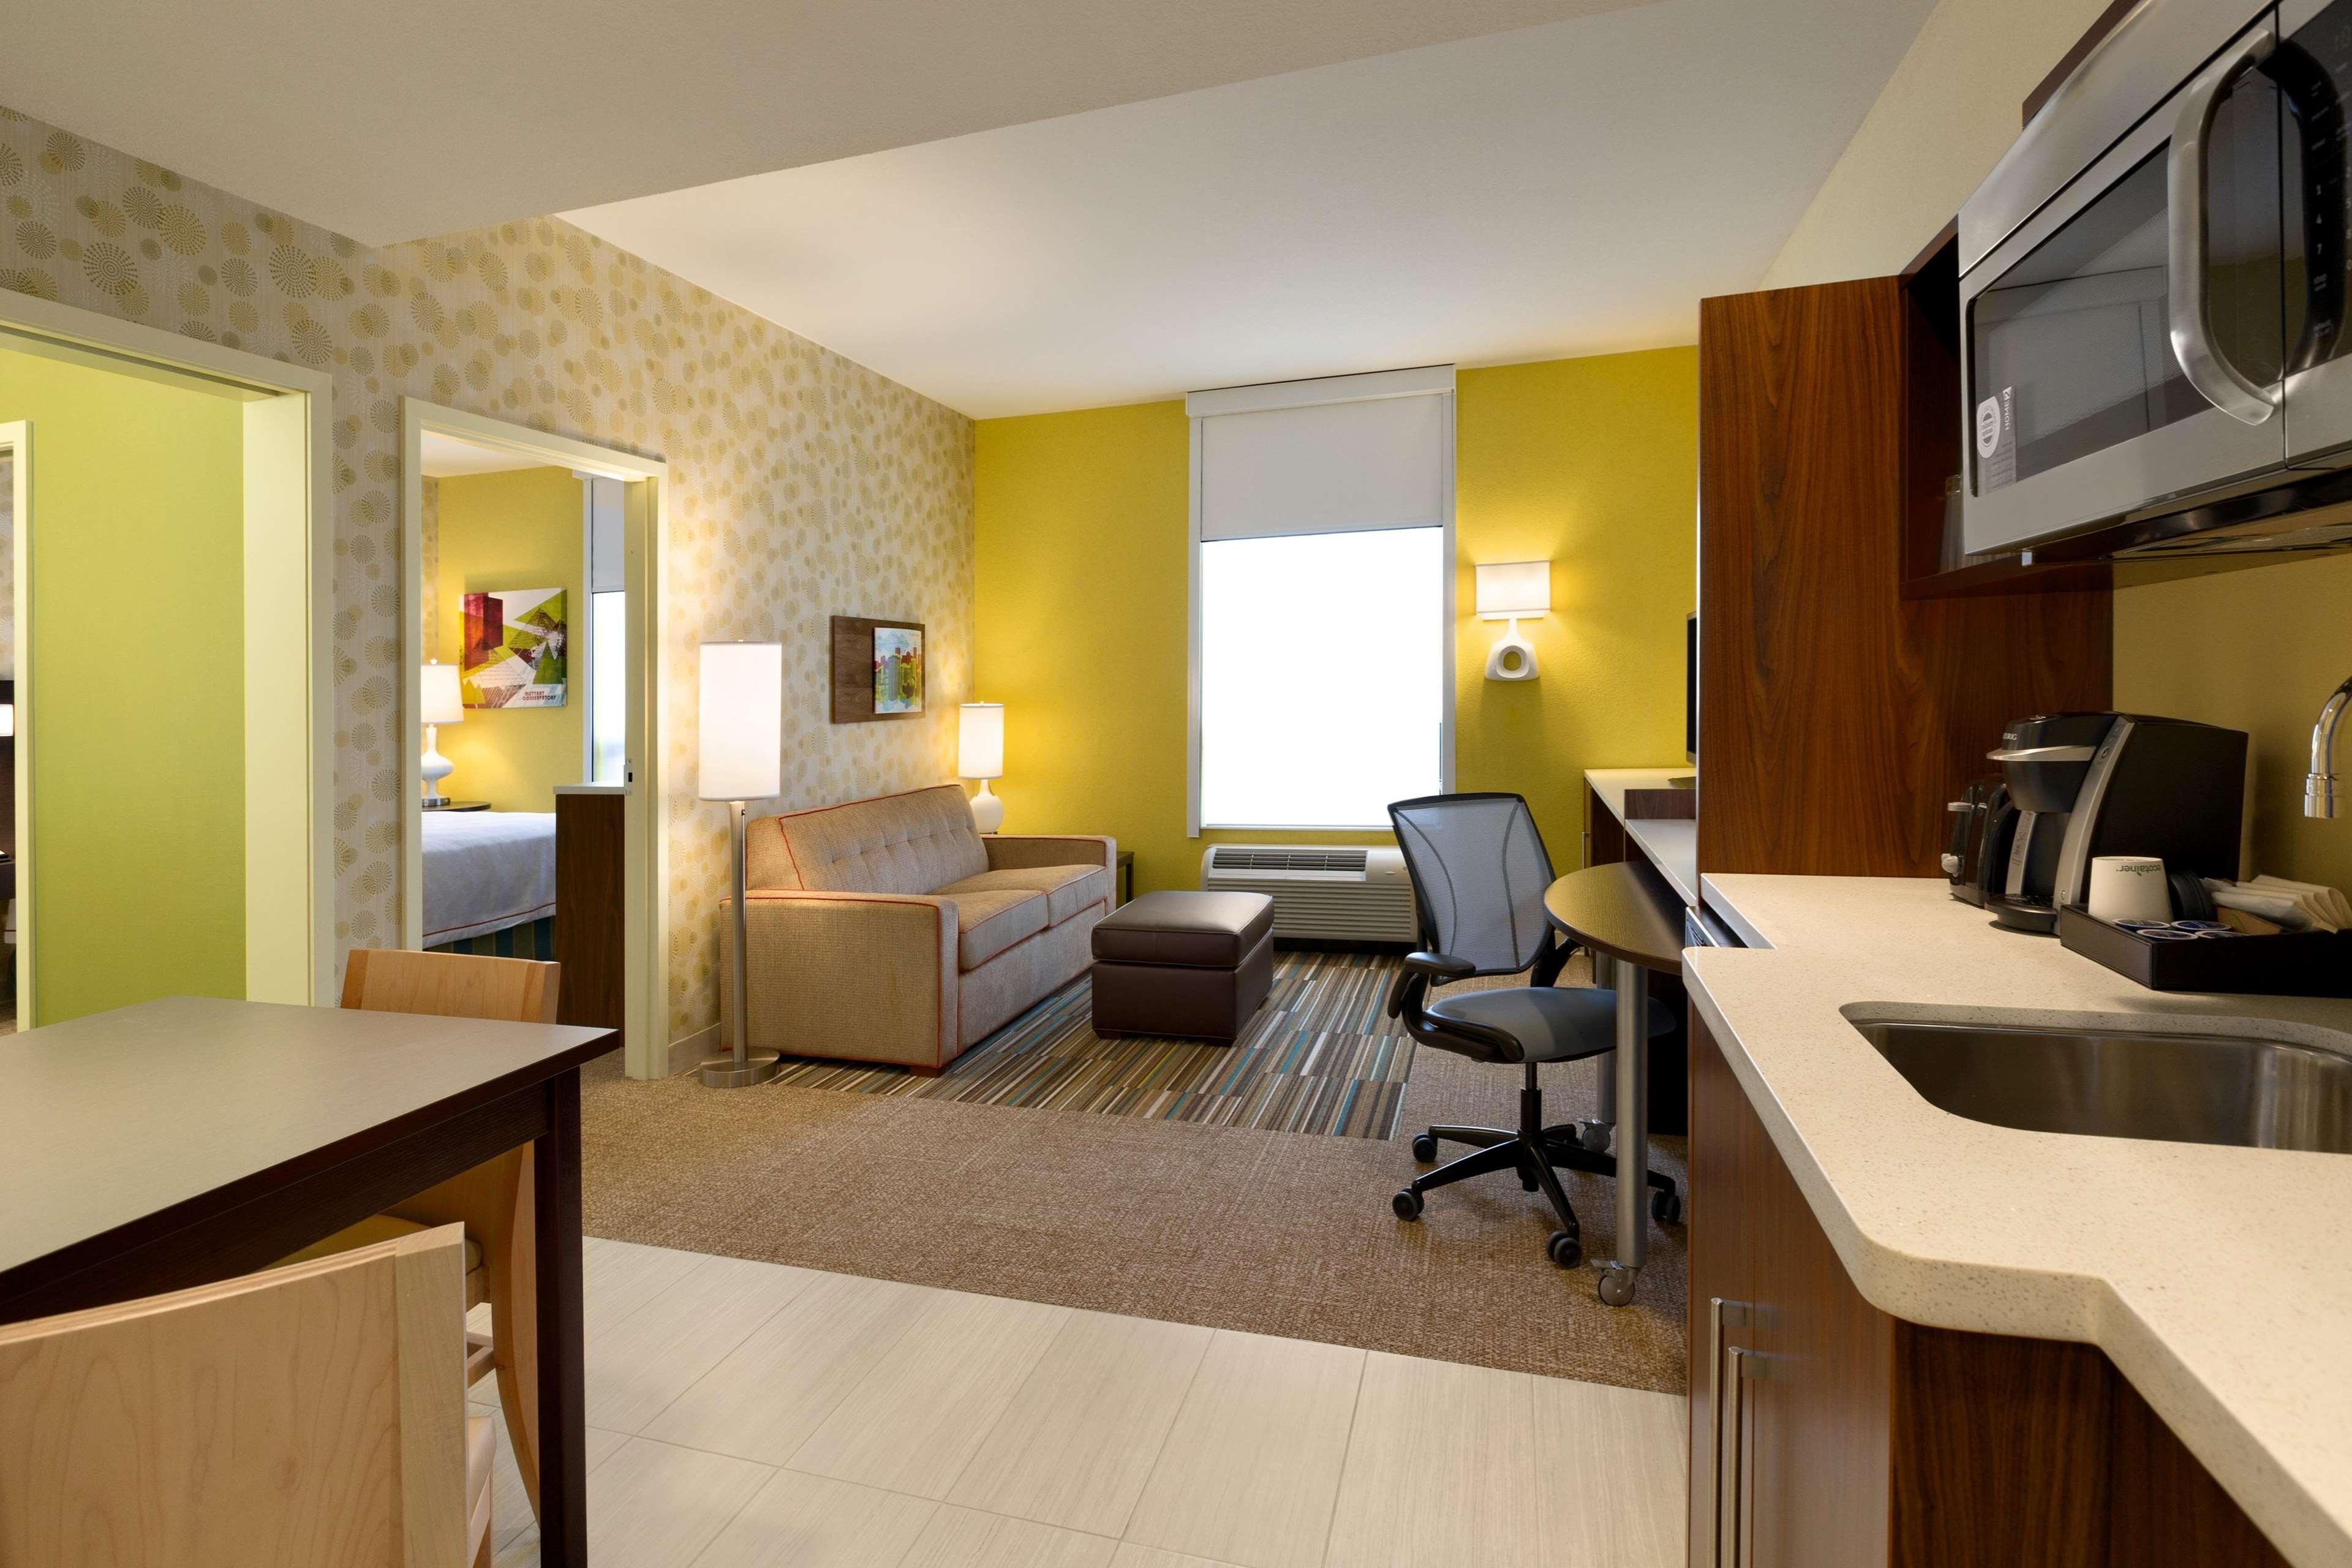 Home2 Suites by Hilton West Edmonton, Alberta, Canada à Edmonton: 1 Queen 1 Bedroom Suite